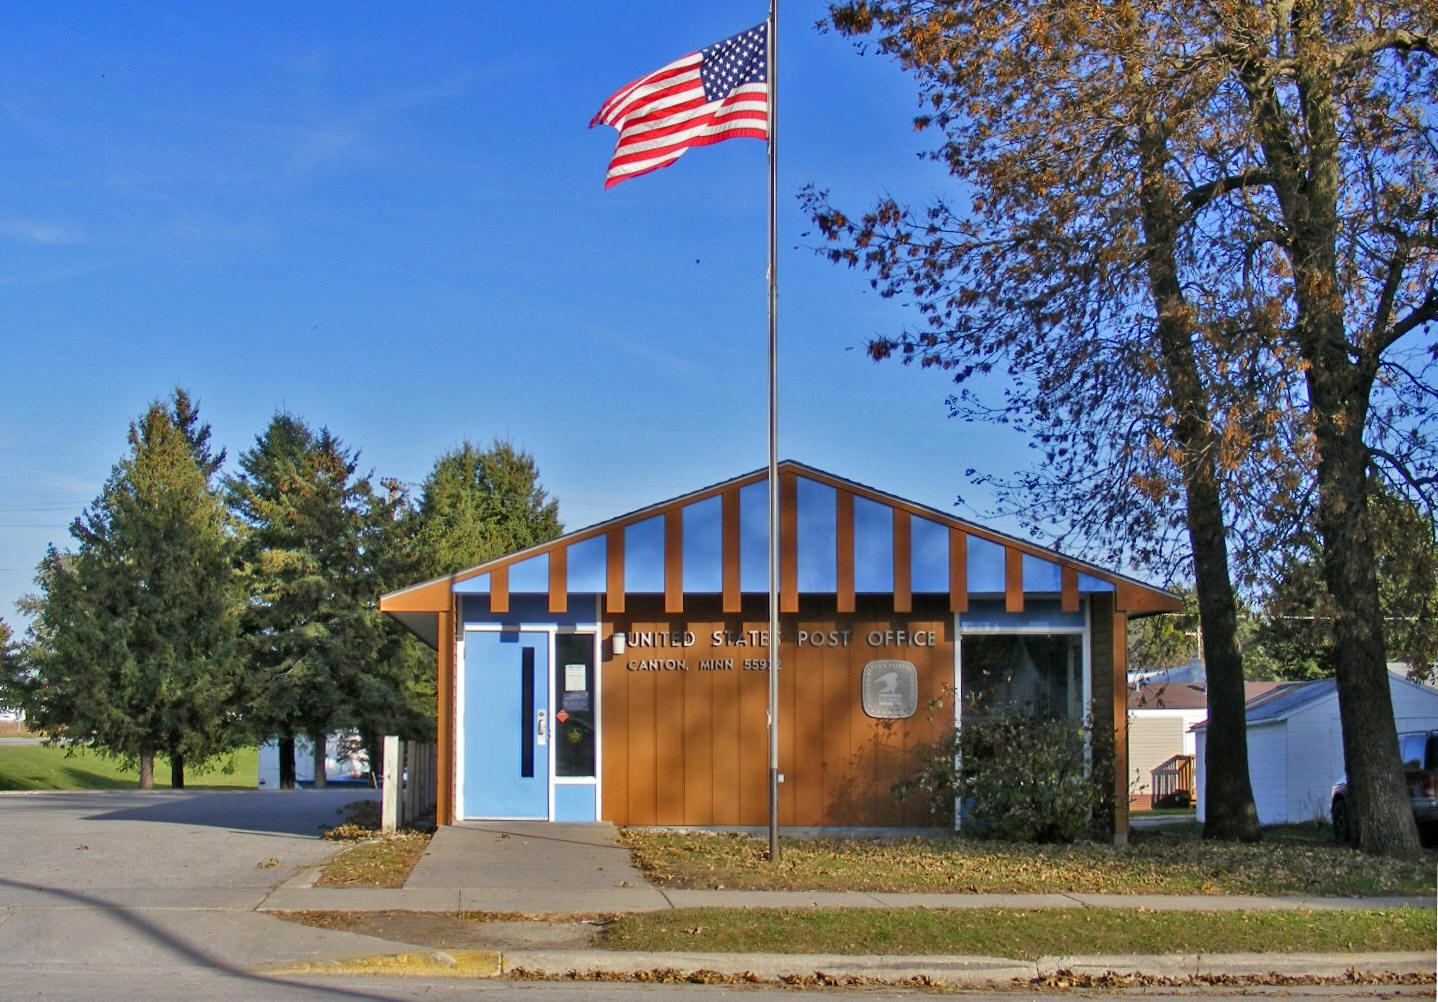 ... US Post Office, Canton Minnesota